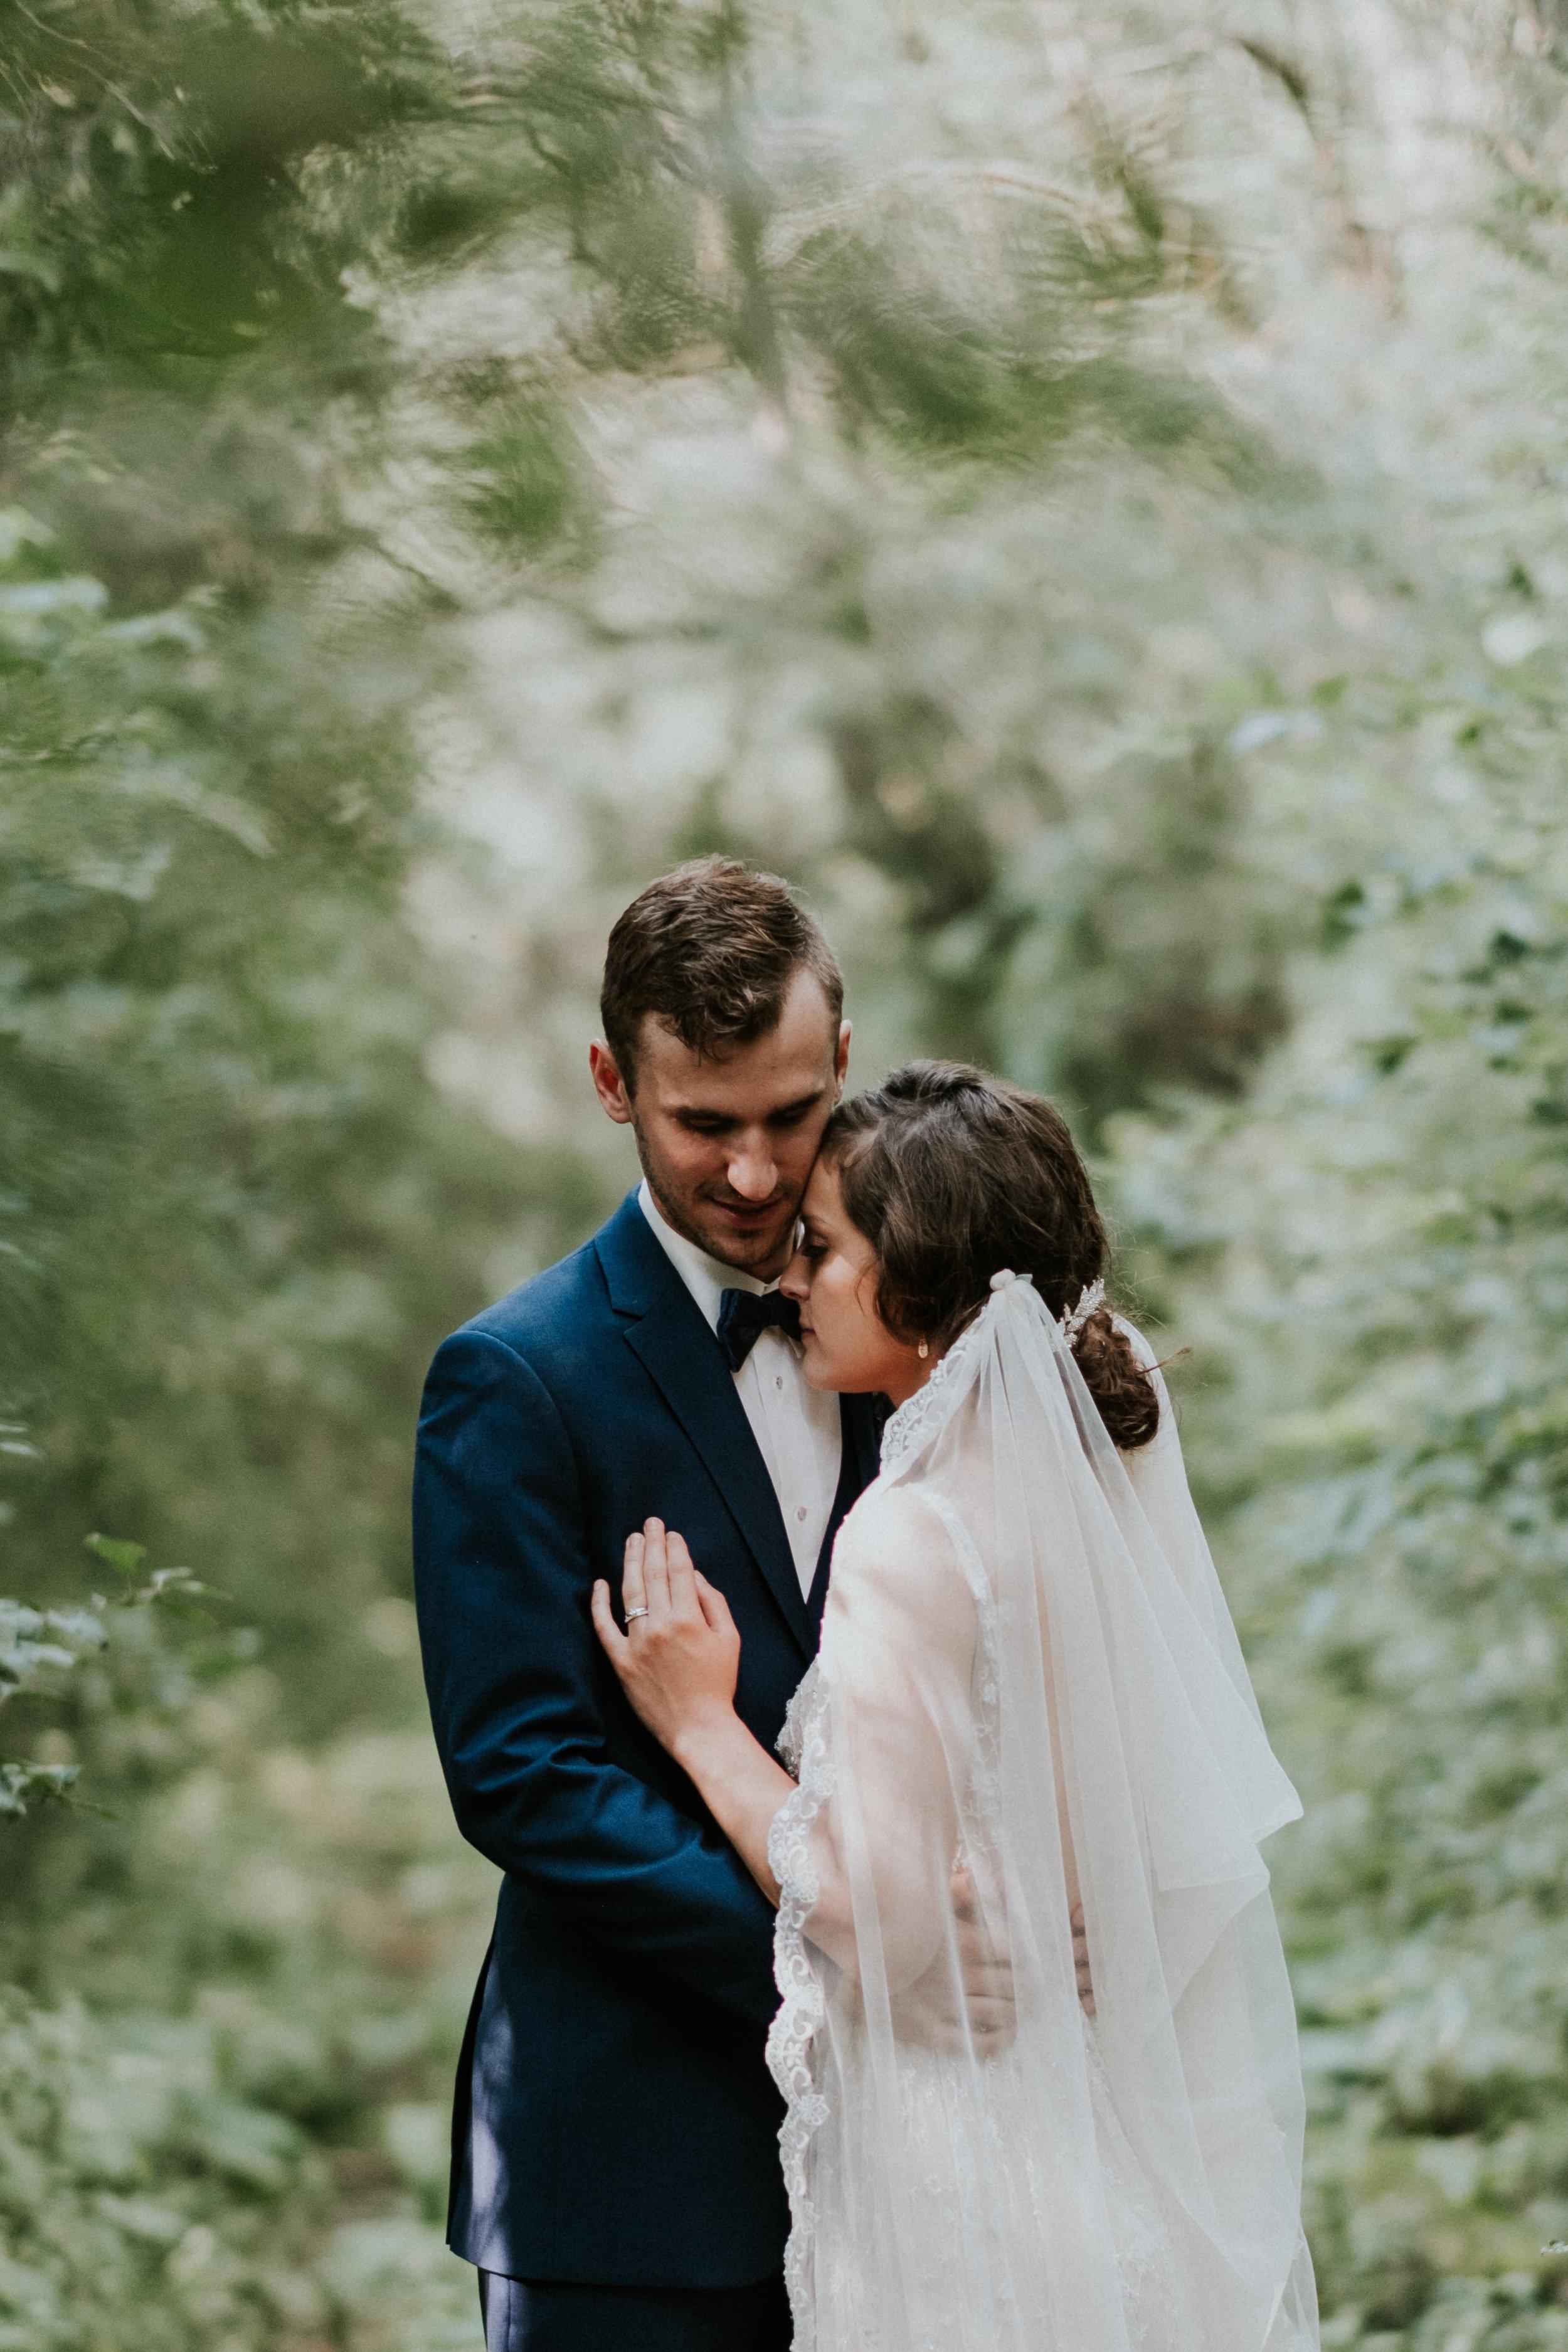 Dillon + Ashley | Vineyard Wedding| Near Freeman, SD | Luke + Savannah Photography-162.jpg